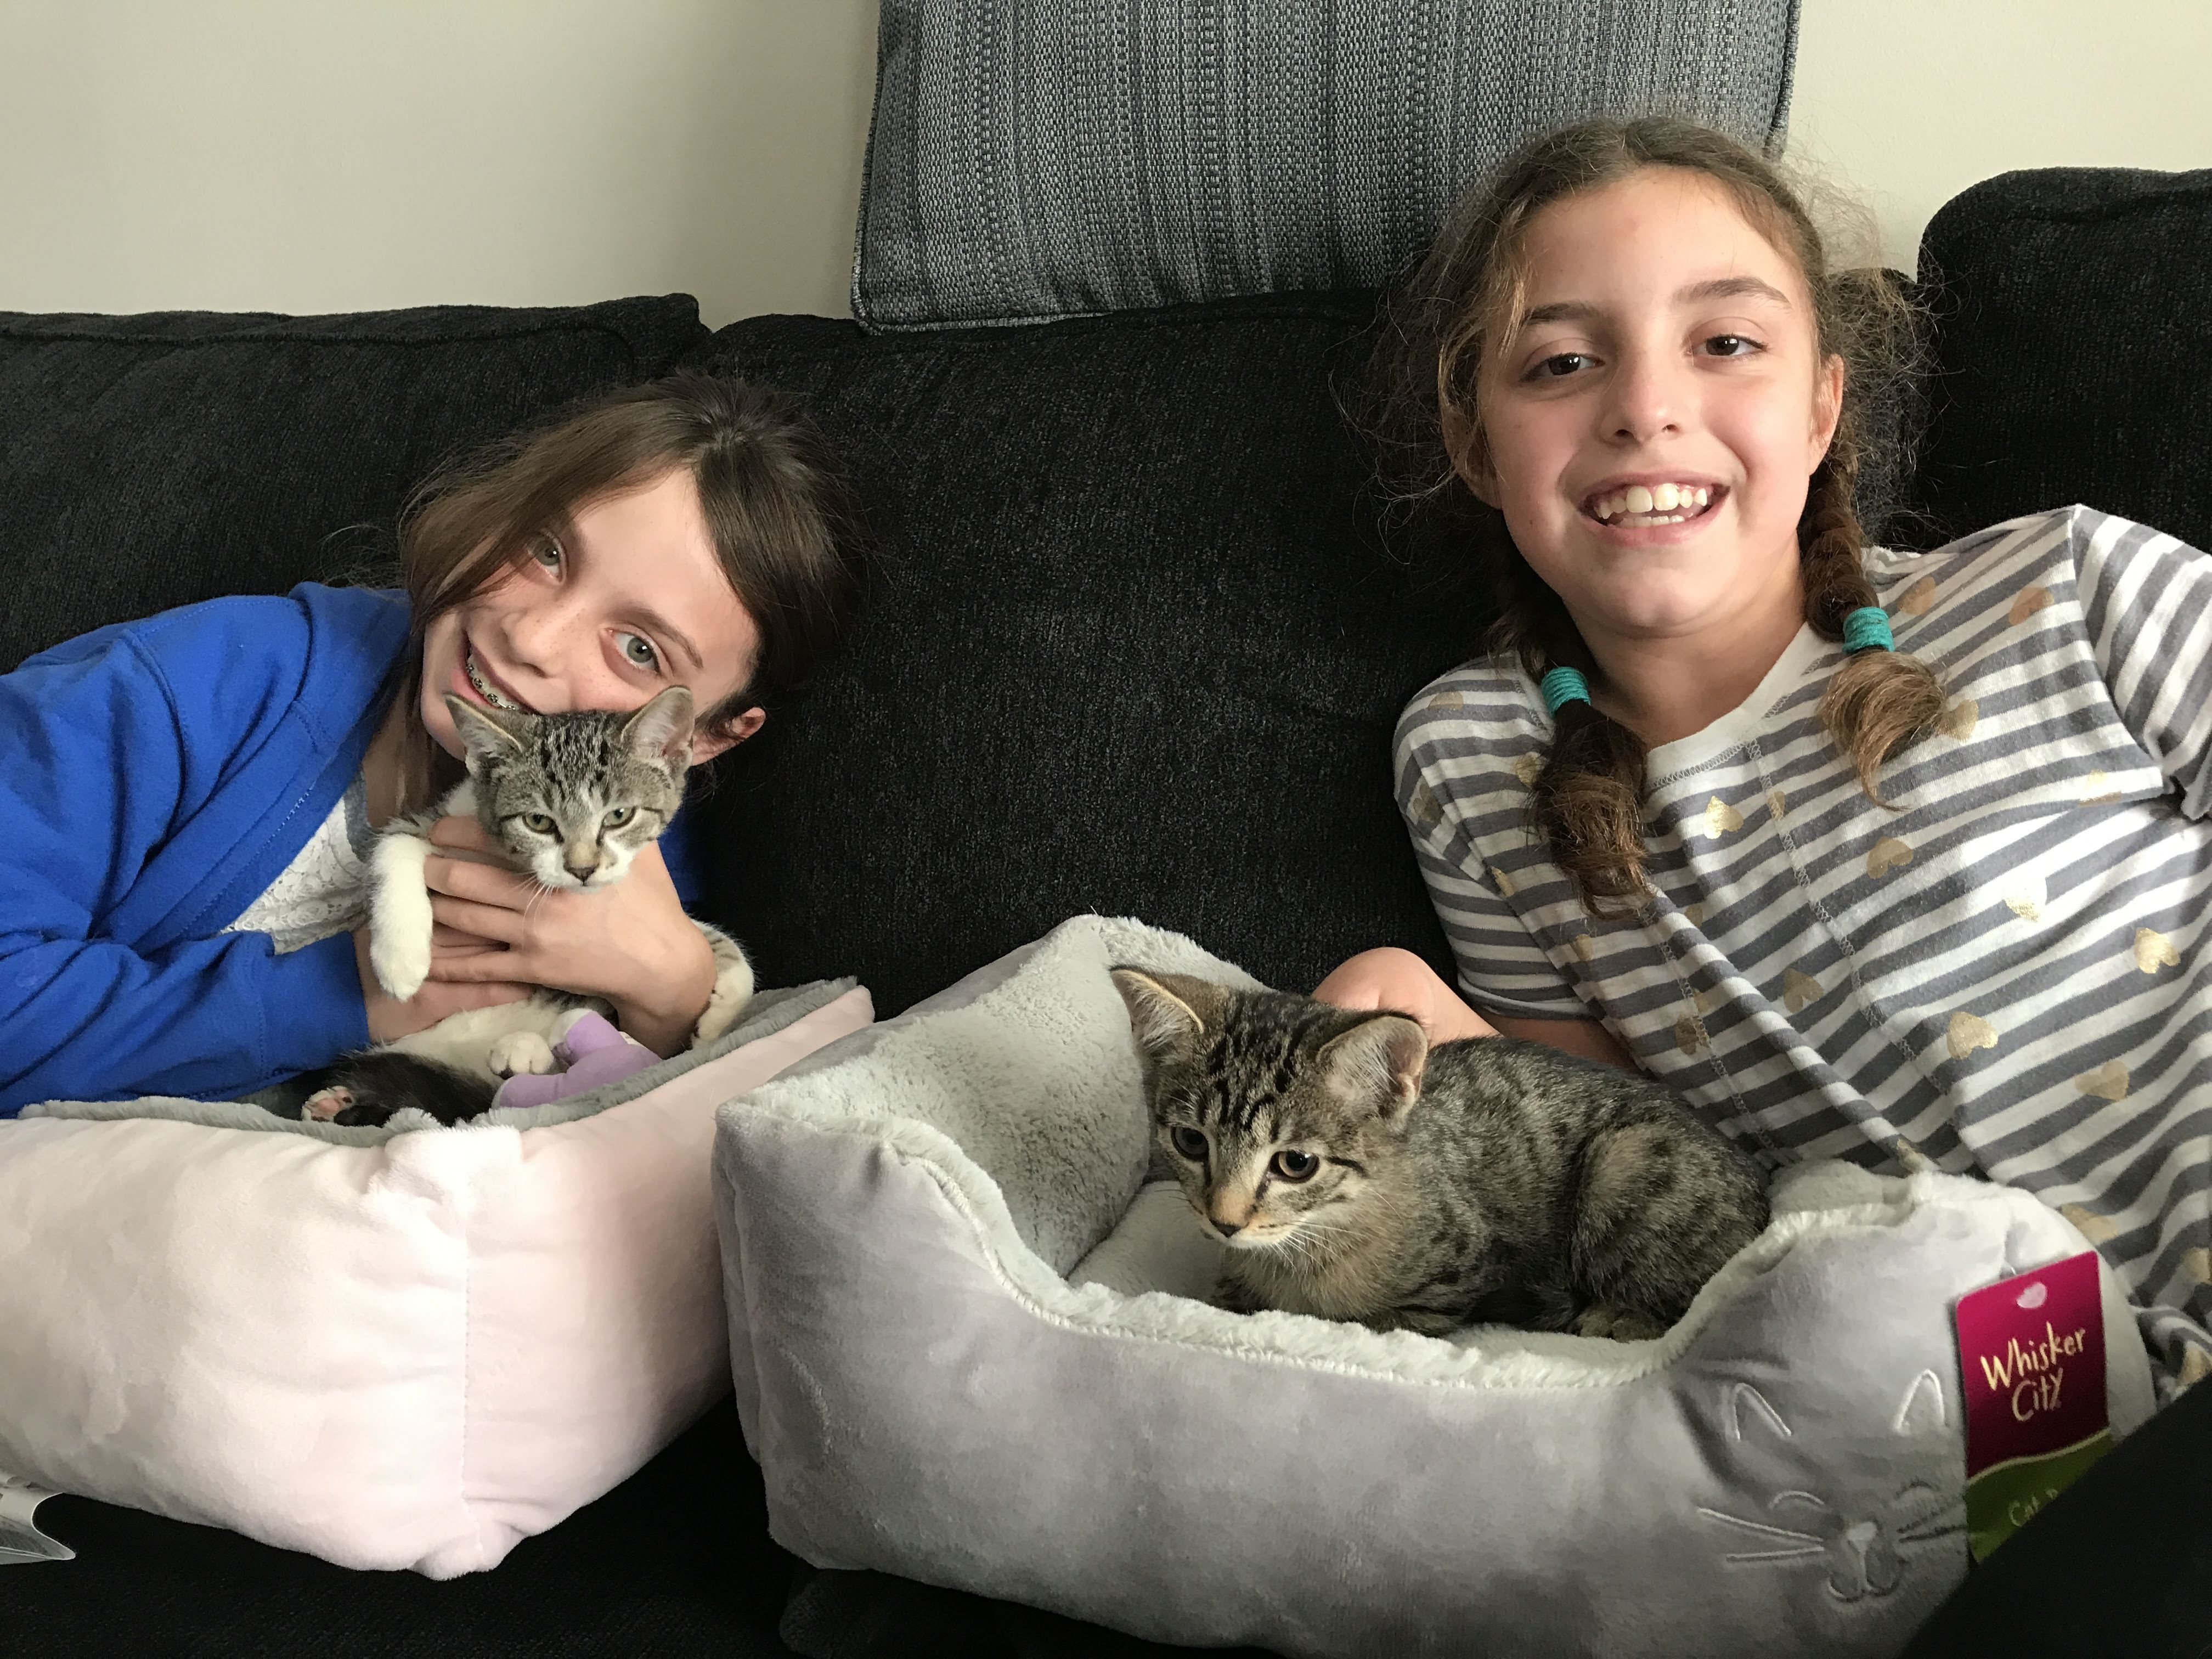 Be an Animal Angel Ambassador like Sophia & Ava